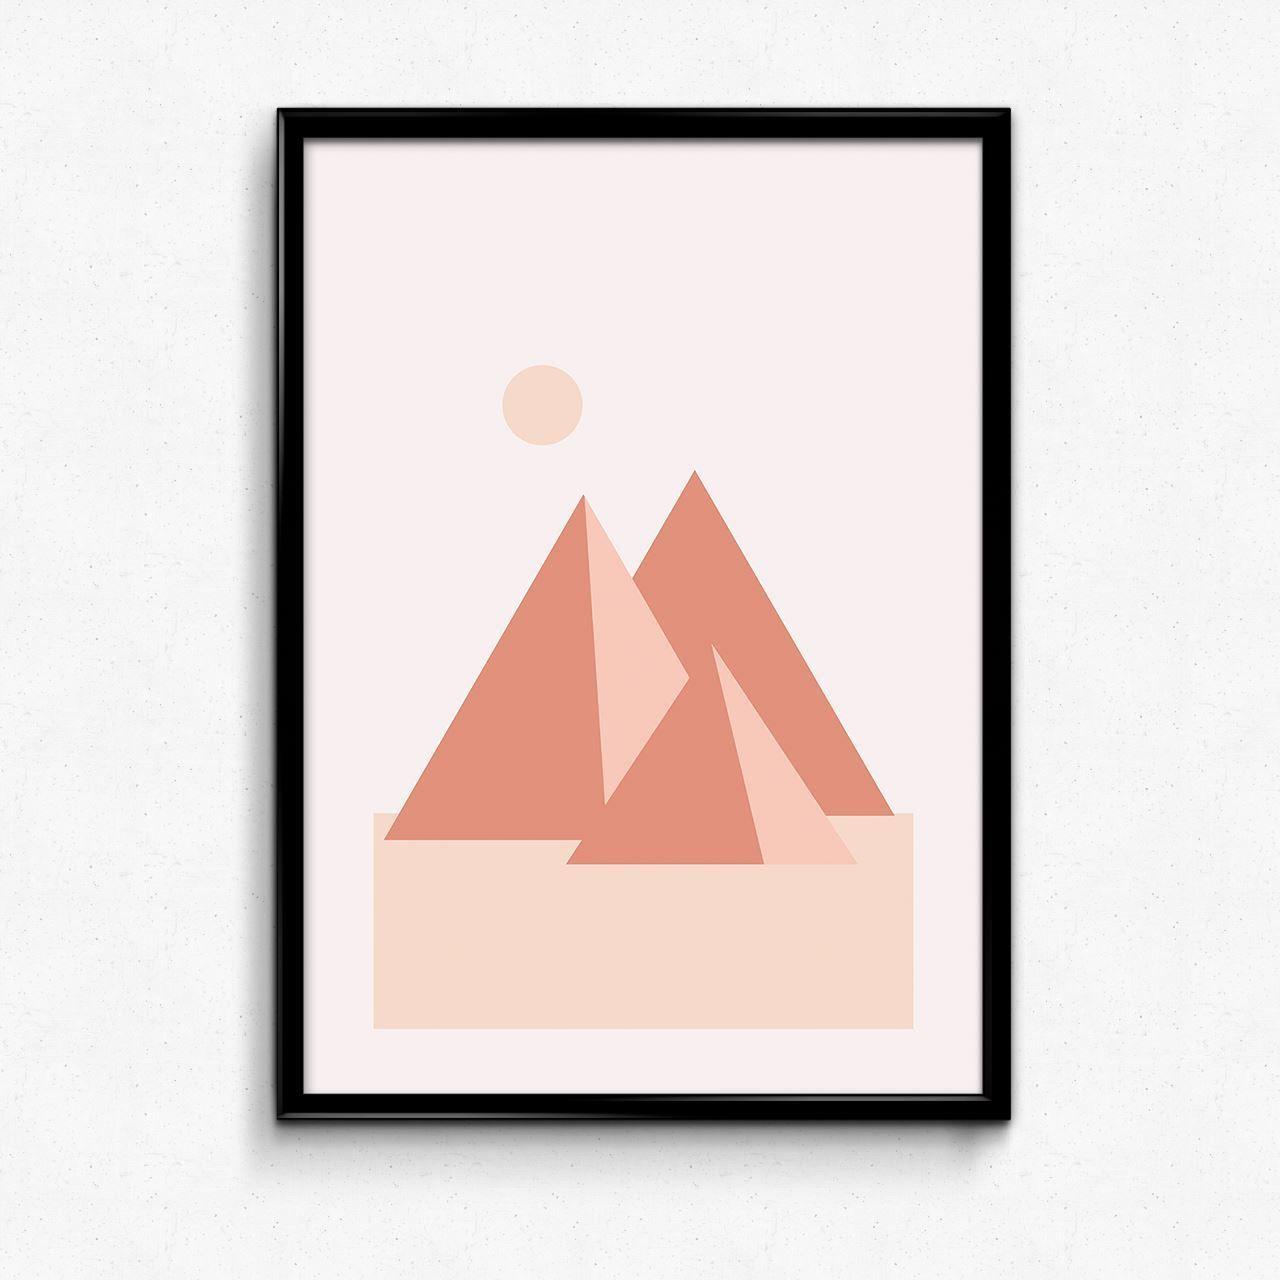 Free Printables In 2020 Poster Prints Free Printable Wall Art Scandinavian Wall Art